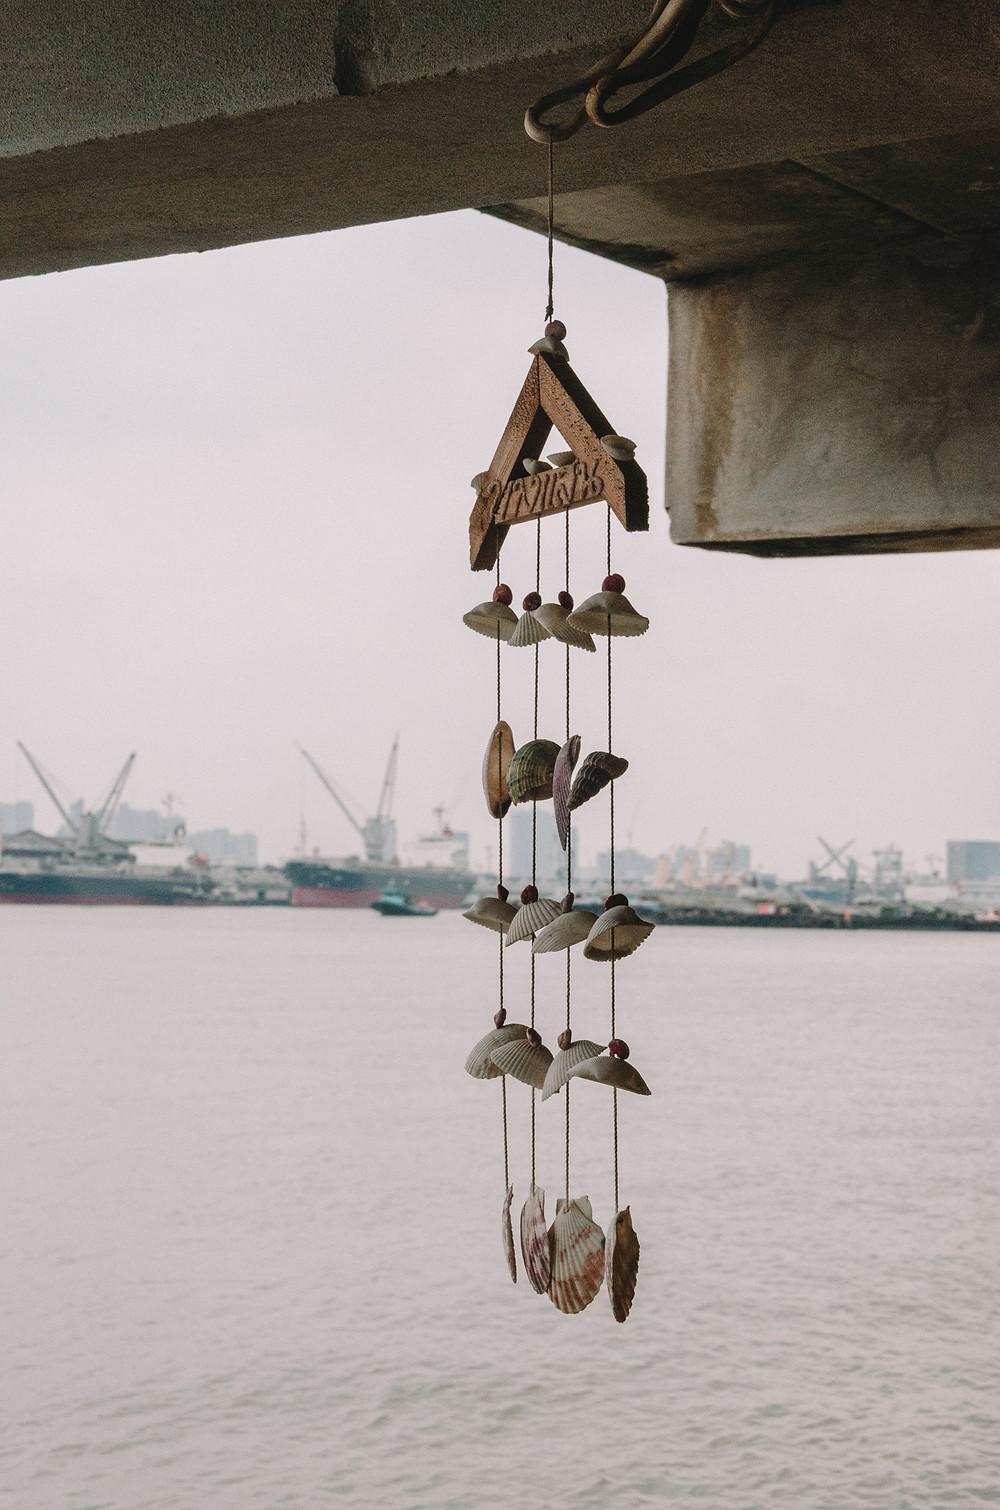 Viiew from pier - Bang Krachao - Bangkok's green lung